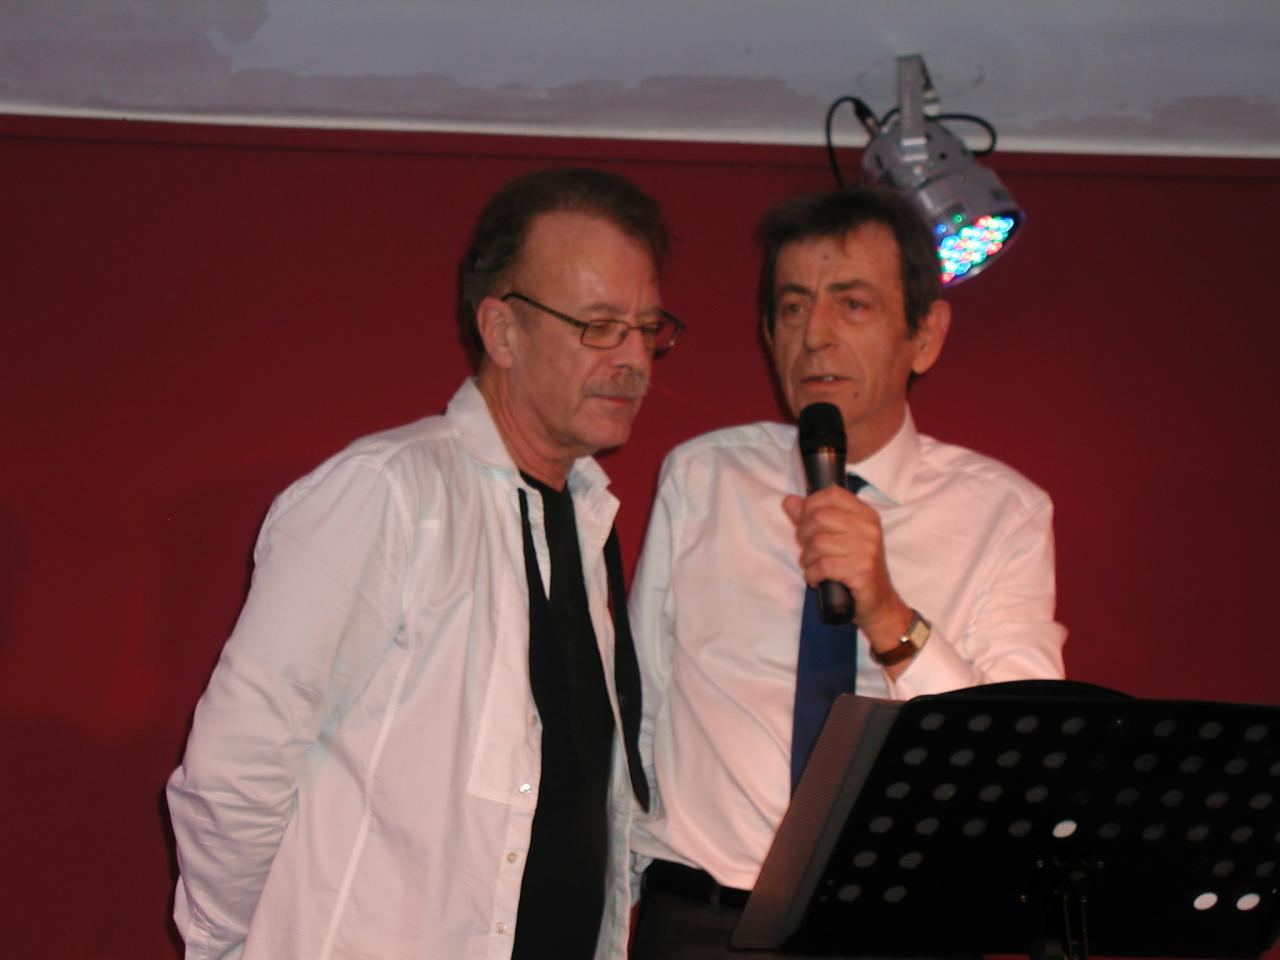 Phil et olivier